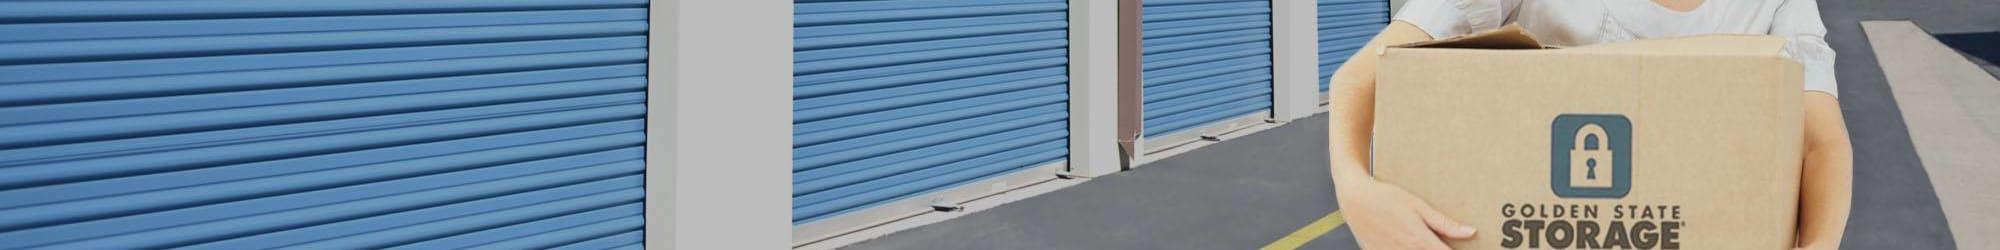 Facility Benefits at Best Storage in Henderson, Nevada